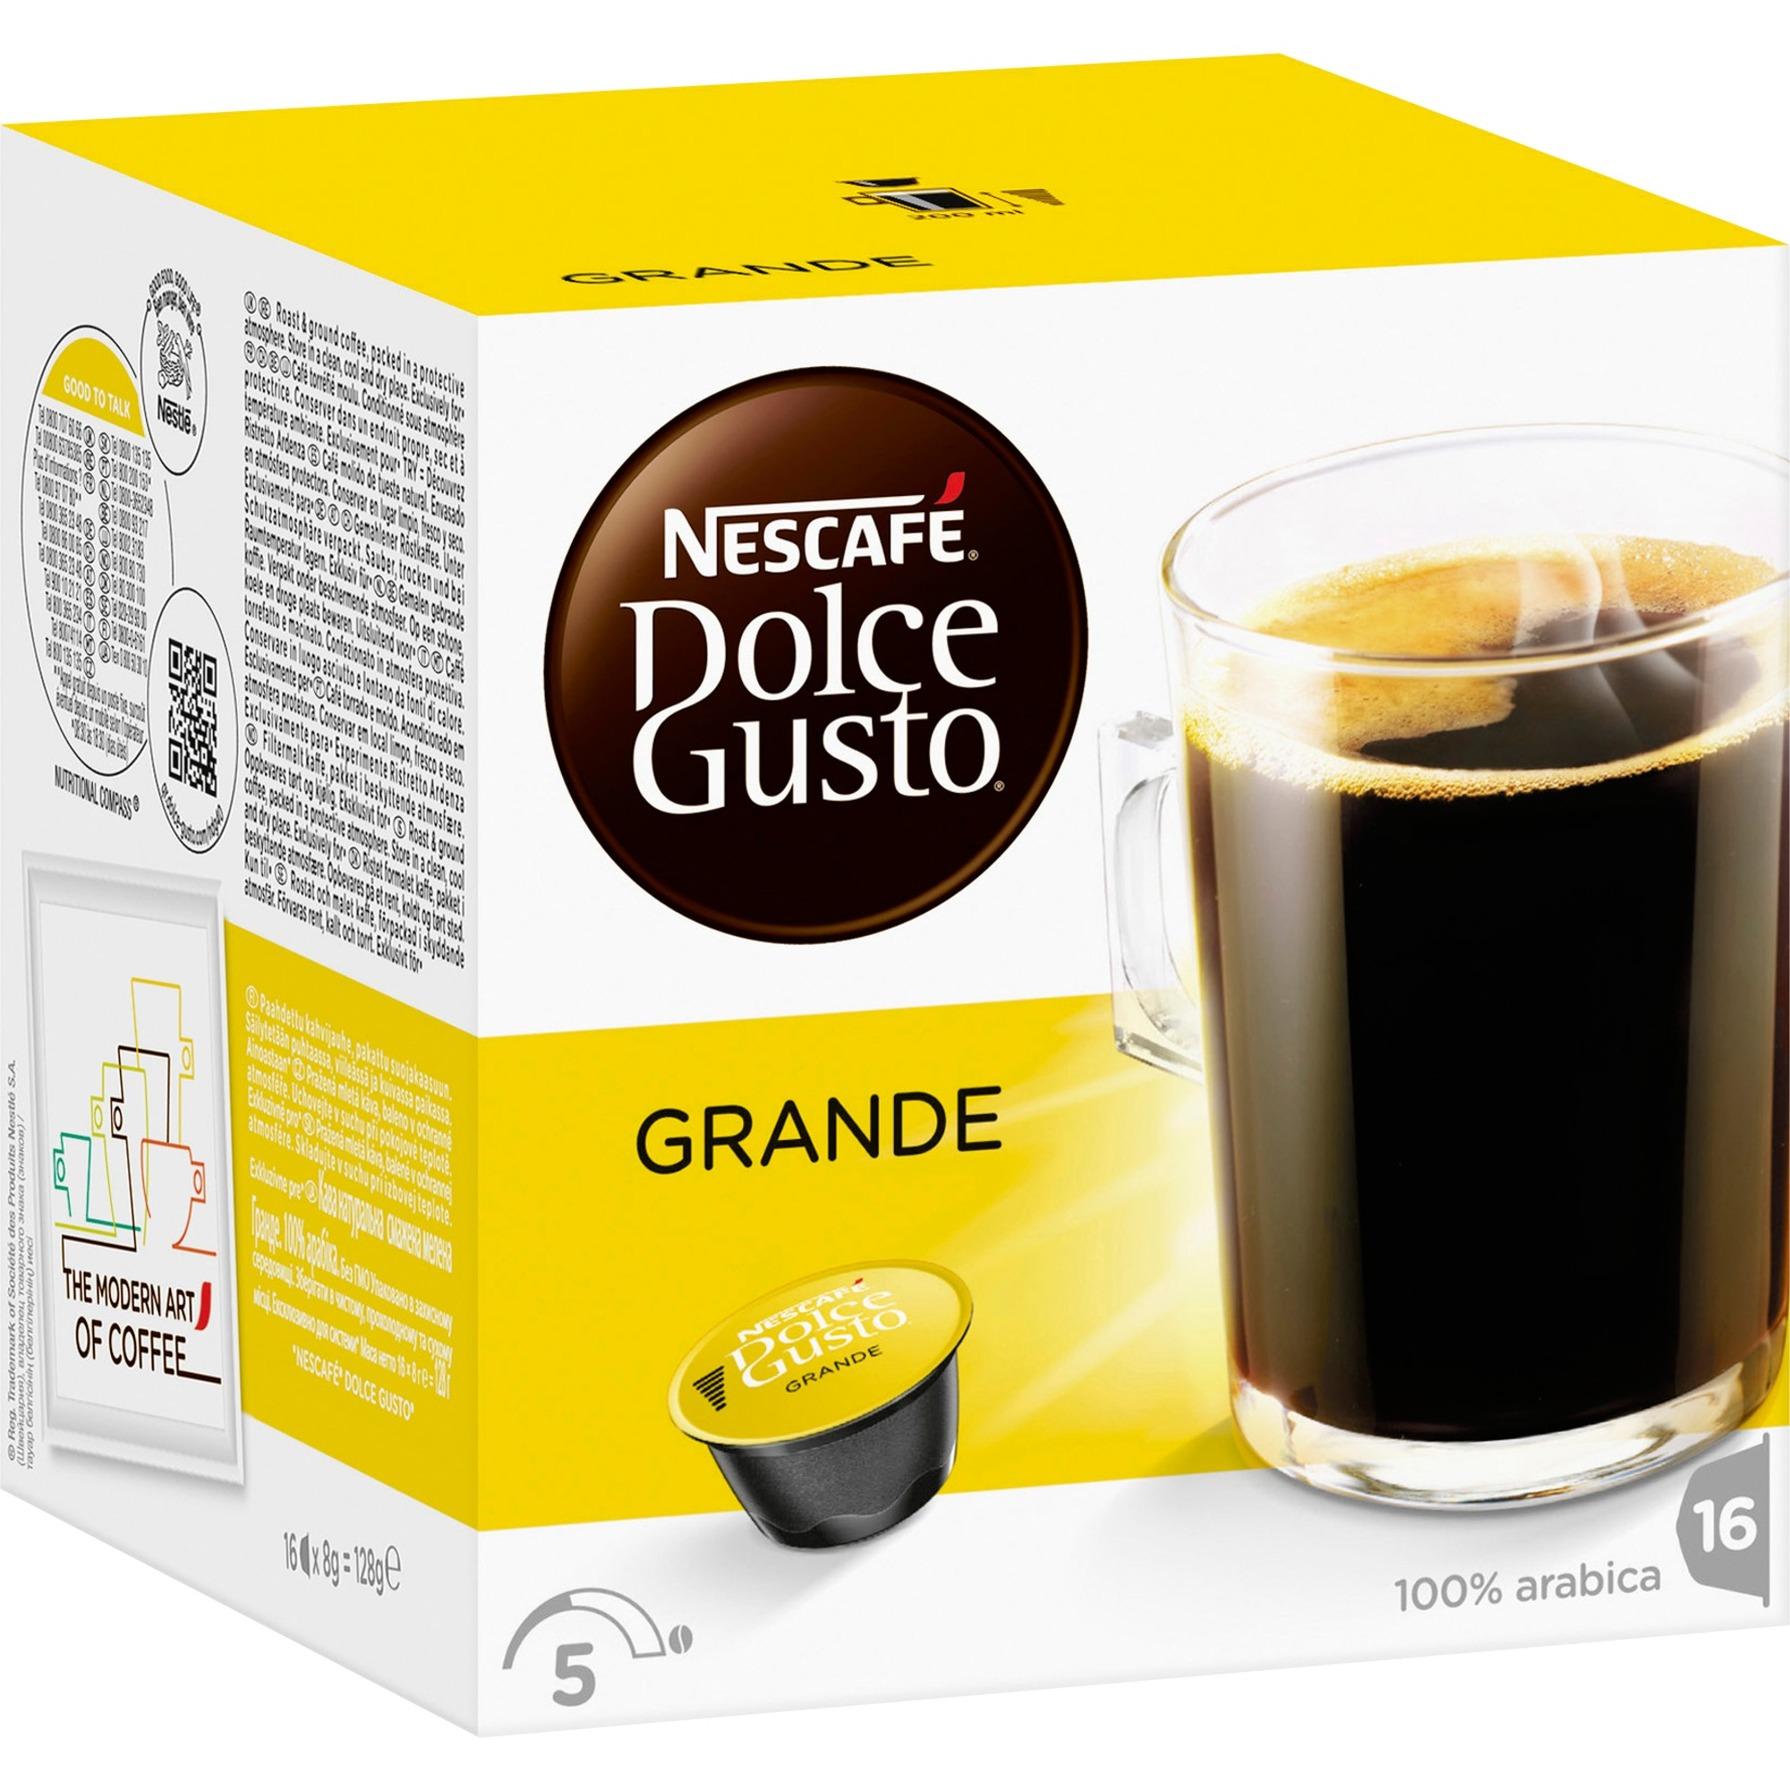 Dolce Gusto Caffè Crema Grande café instantáneo, Cápsula de bebida